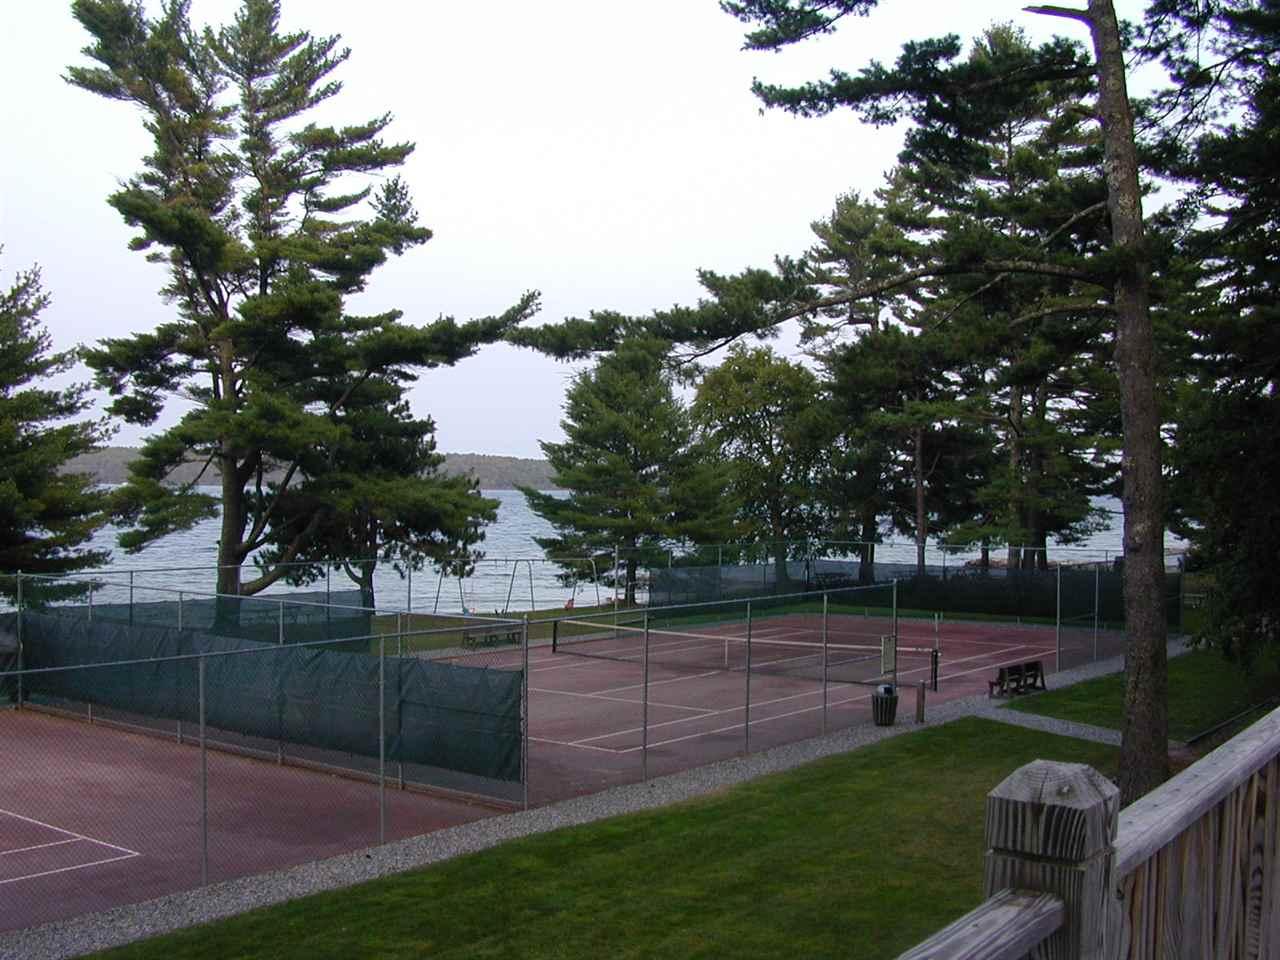 GIC Tennis Courts 11246176